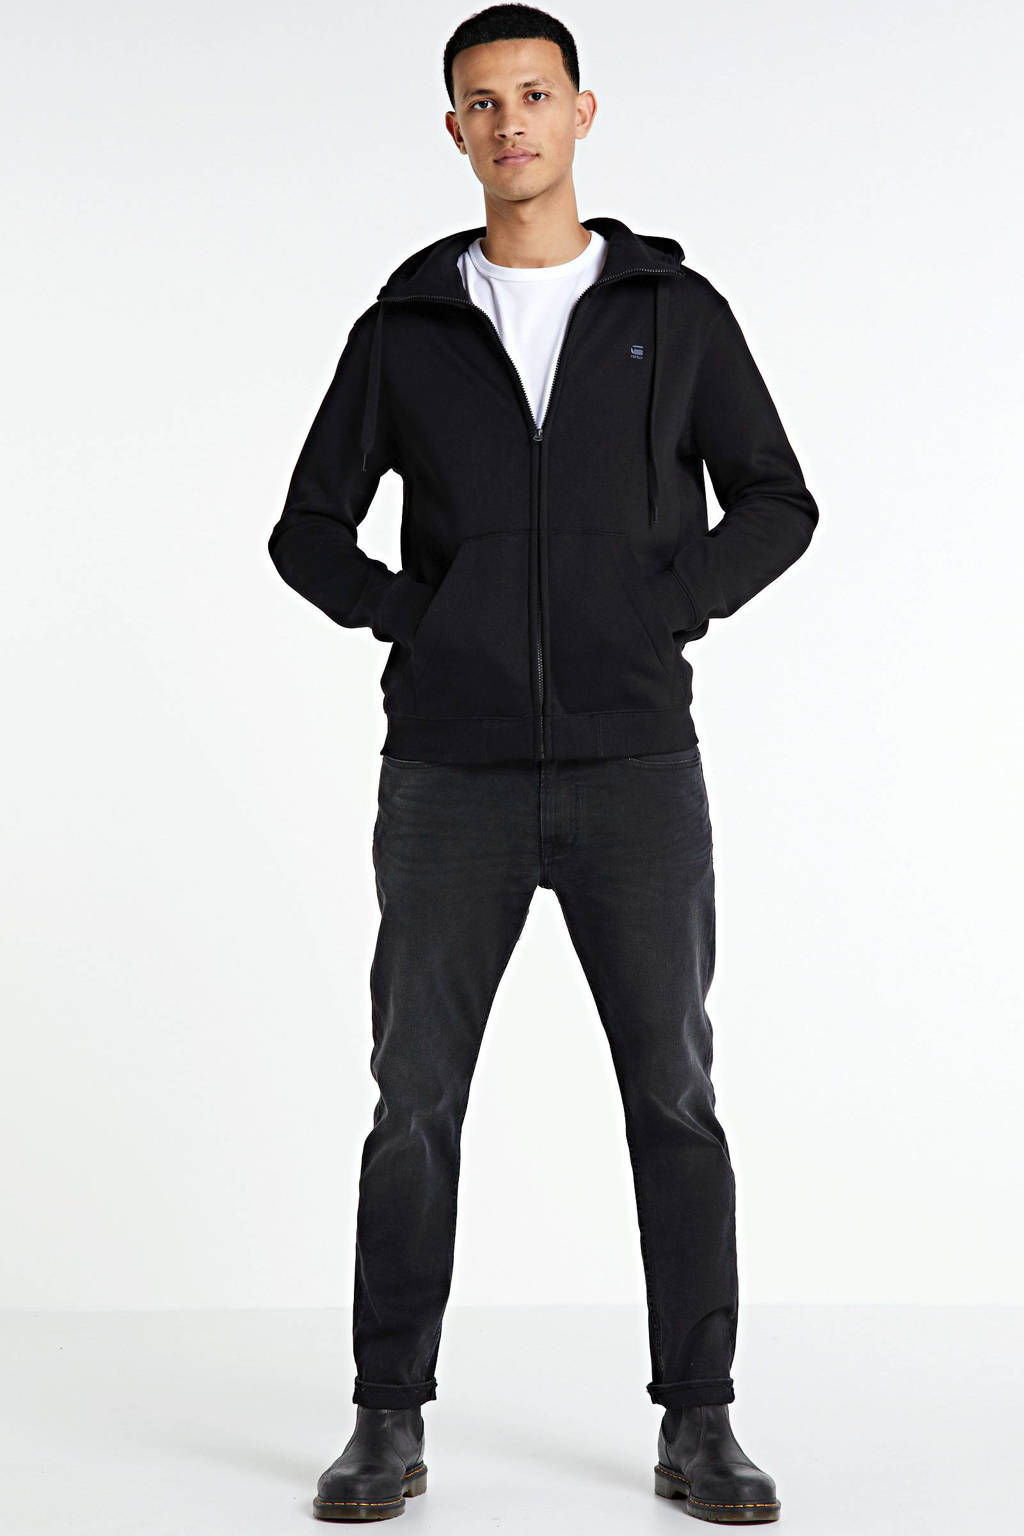 Kings of Indigo slim fit jeans black used, Black used